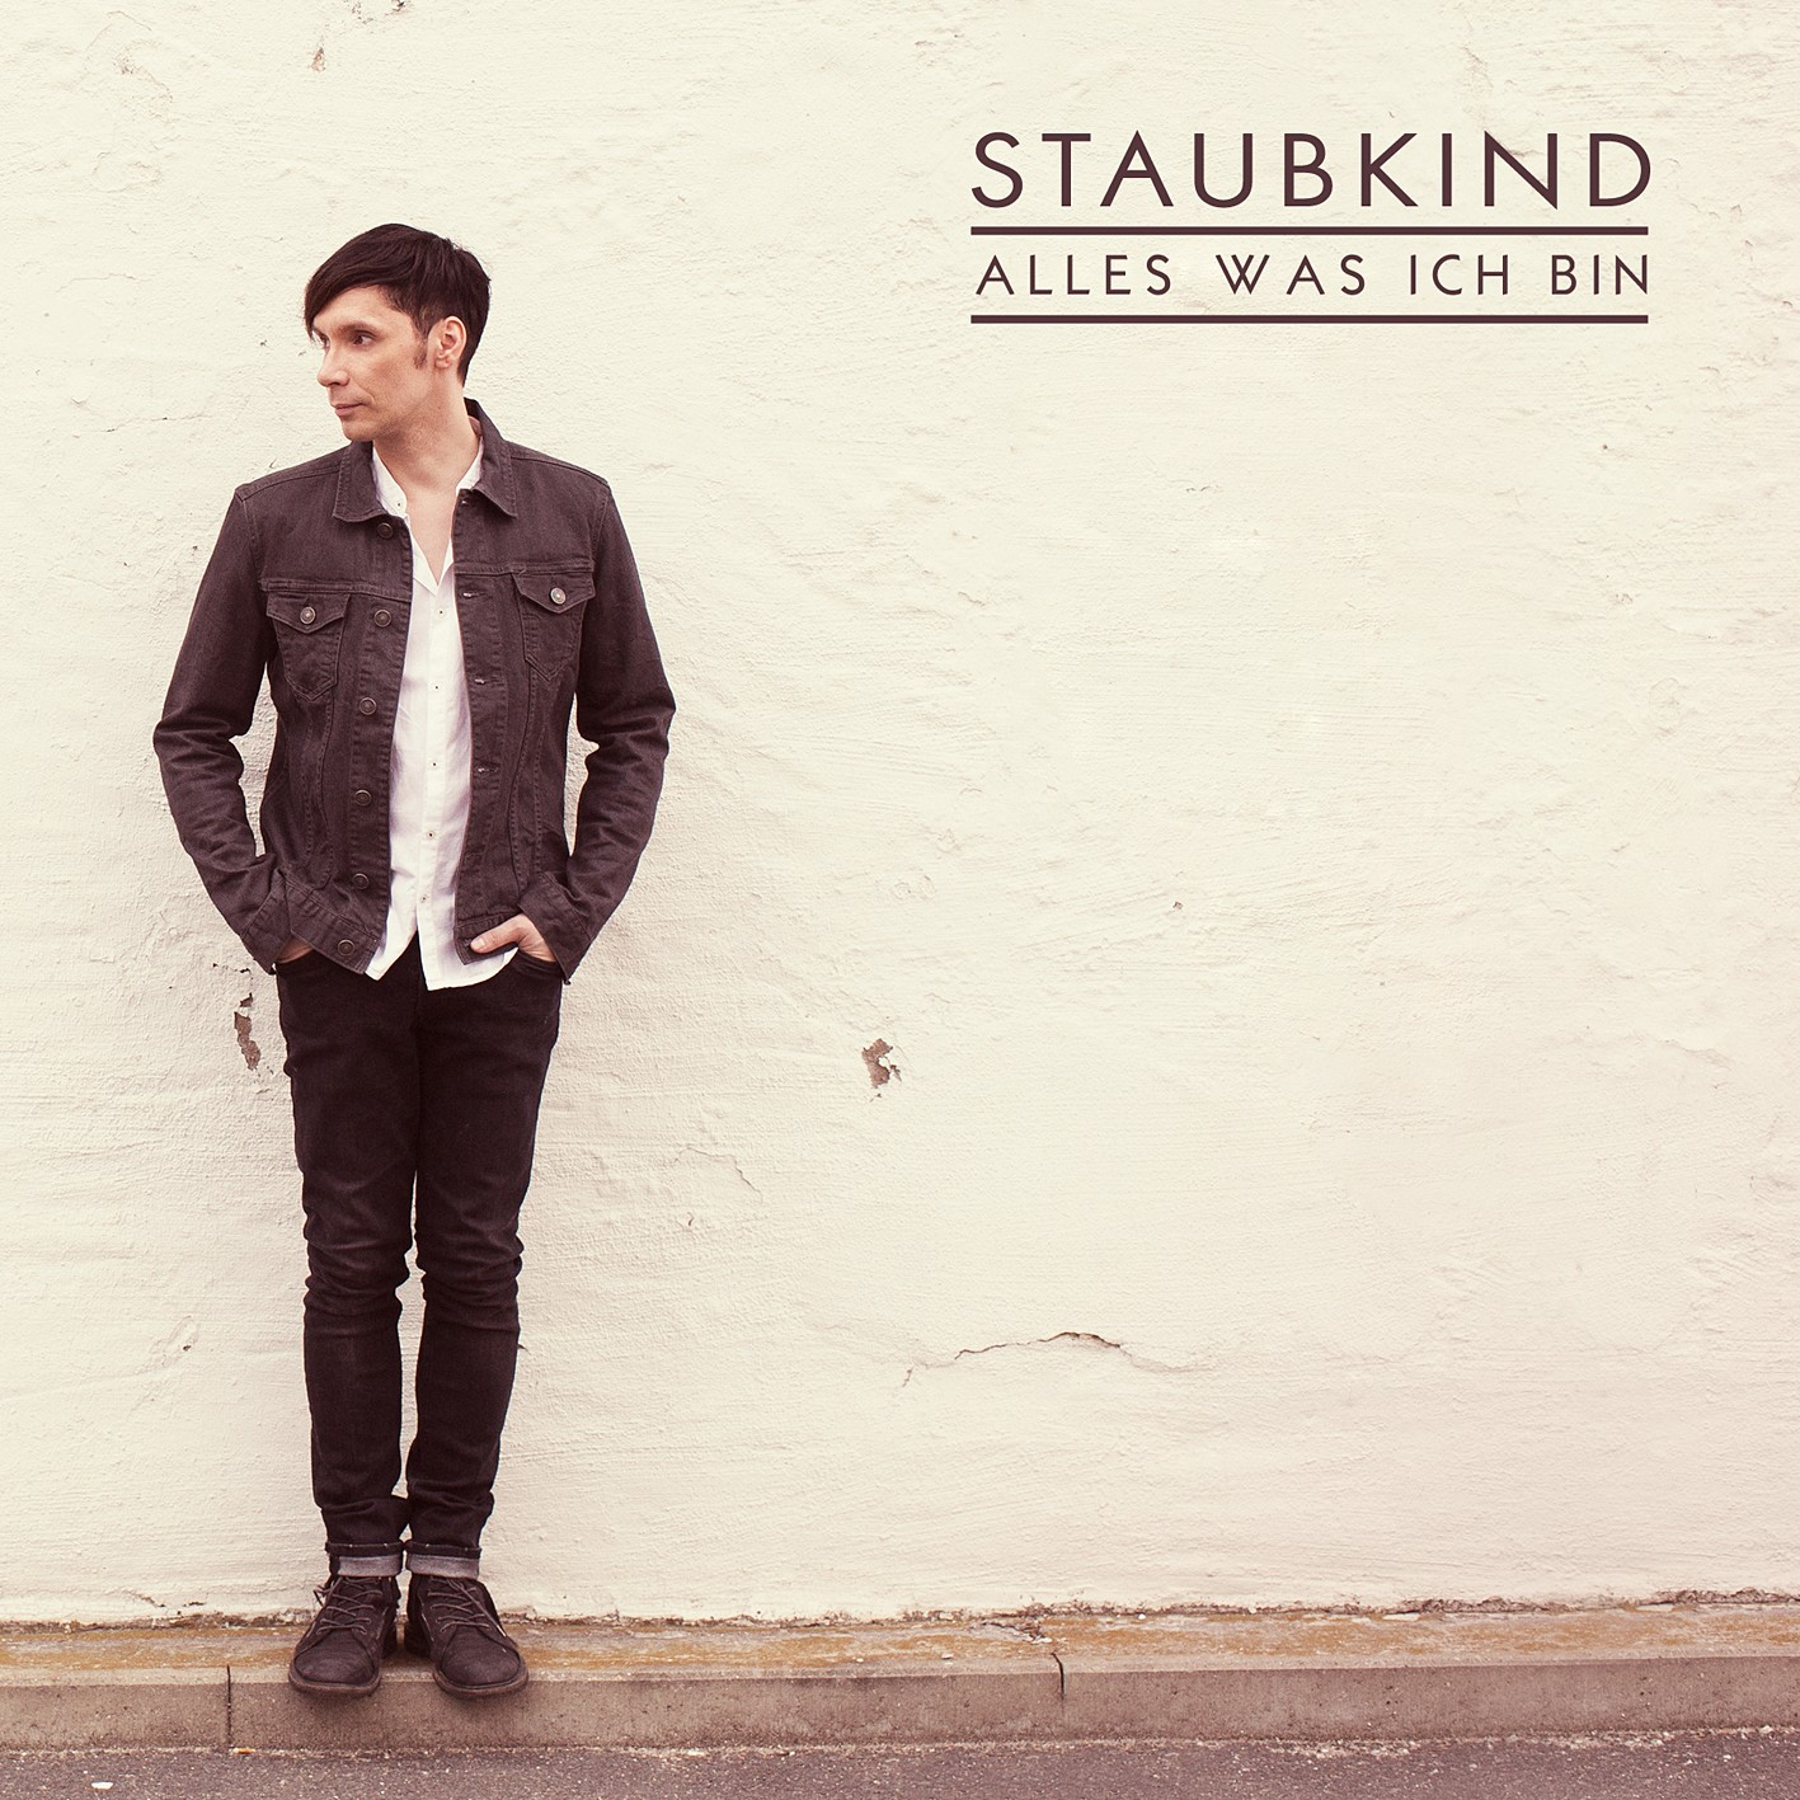 Staubkind - Alles was ich bin (Deluxe) - 2CD